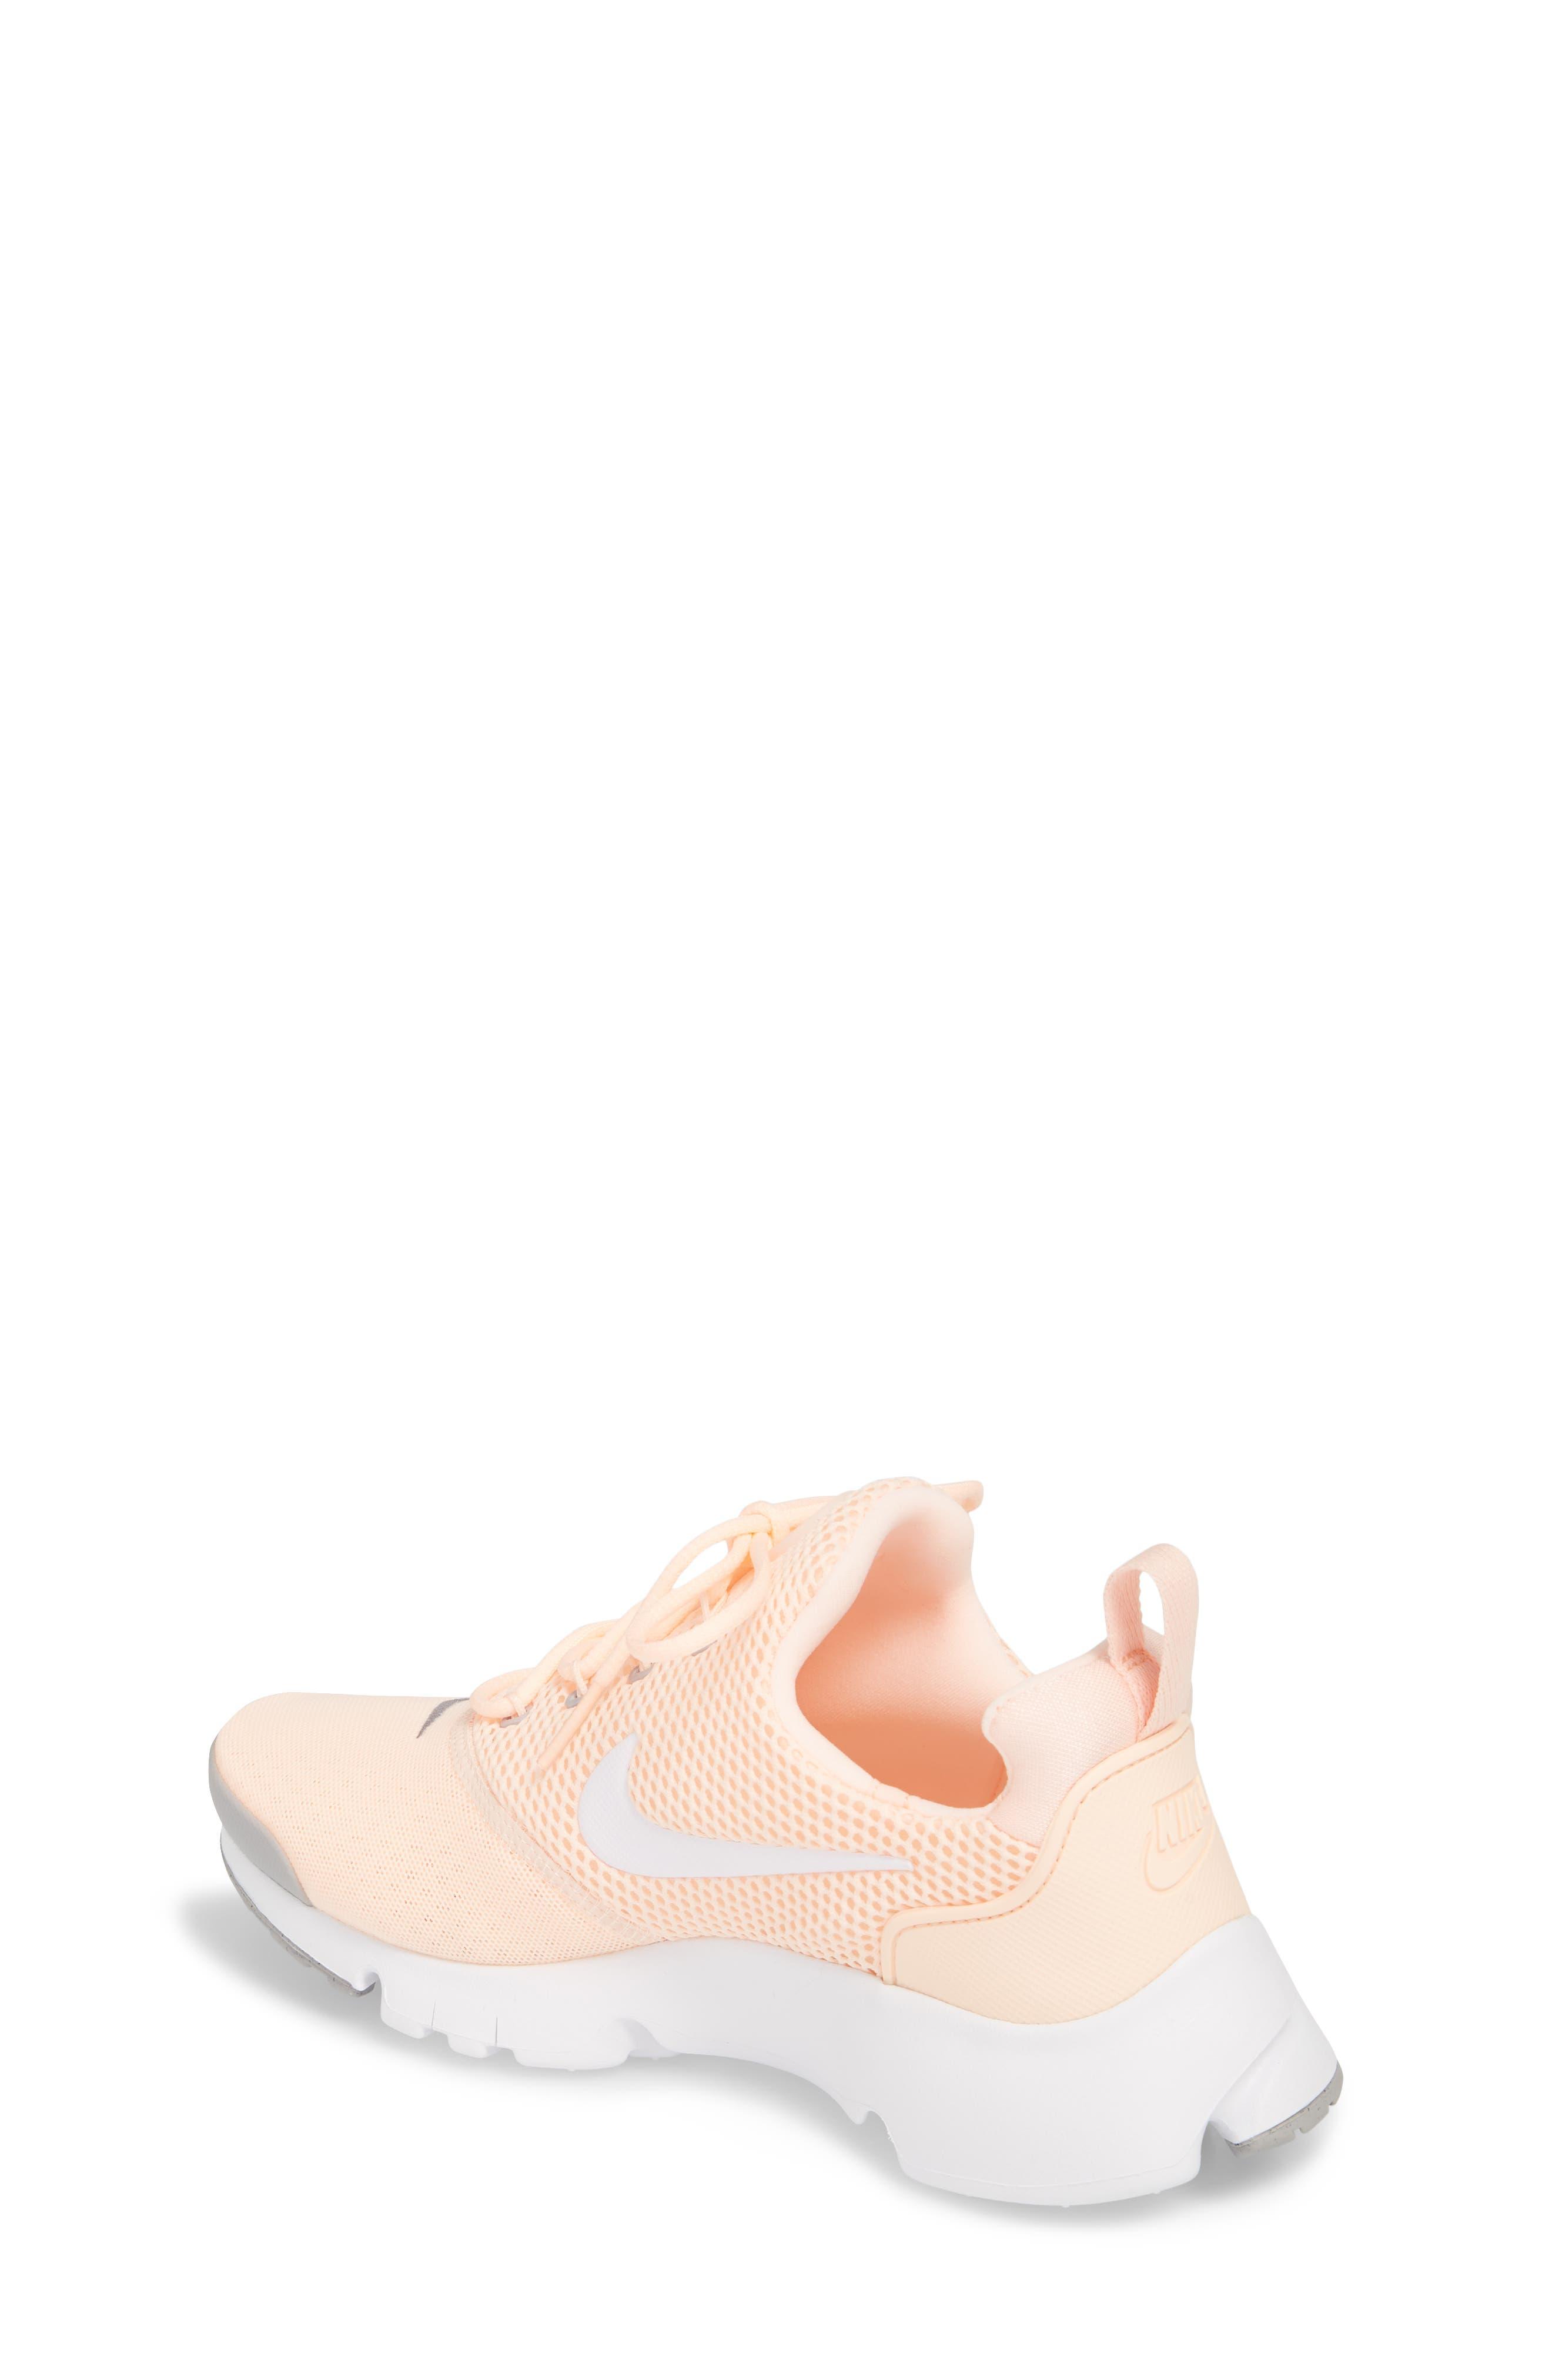 Presto Fly Sneaker,                             Alternate thumbnail 3, color,                             Crimson Tint/ White/ Grey